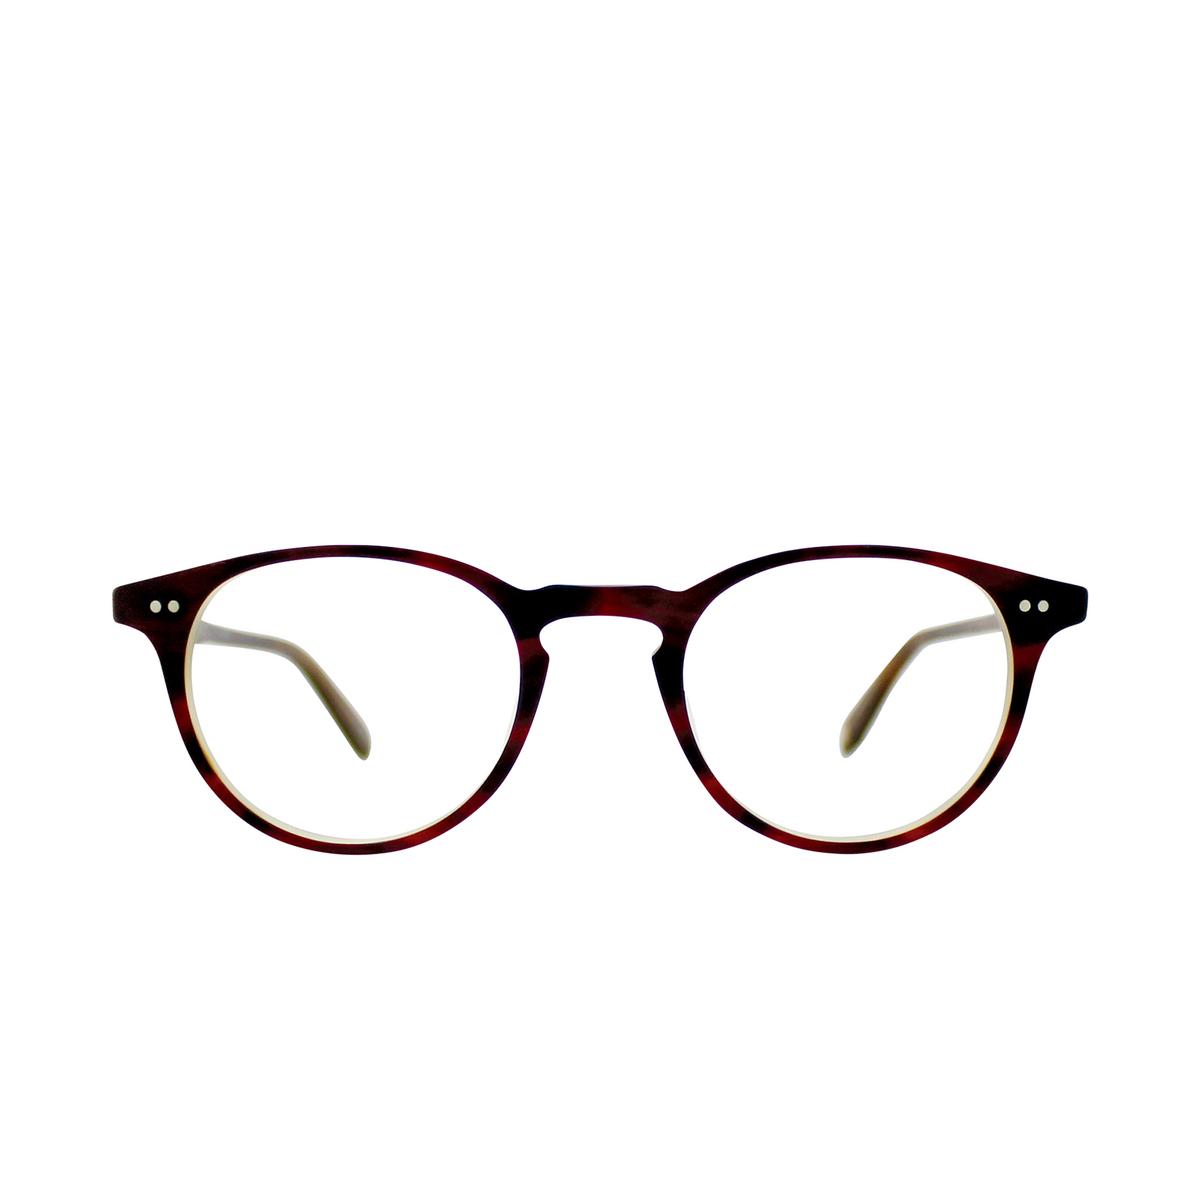 Garrett Leight® Round Eyeglasses: Winward color Matte Whiskey Tortoi Mwht.